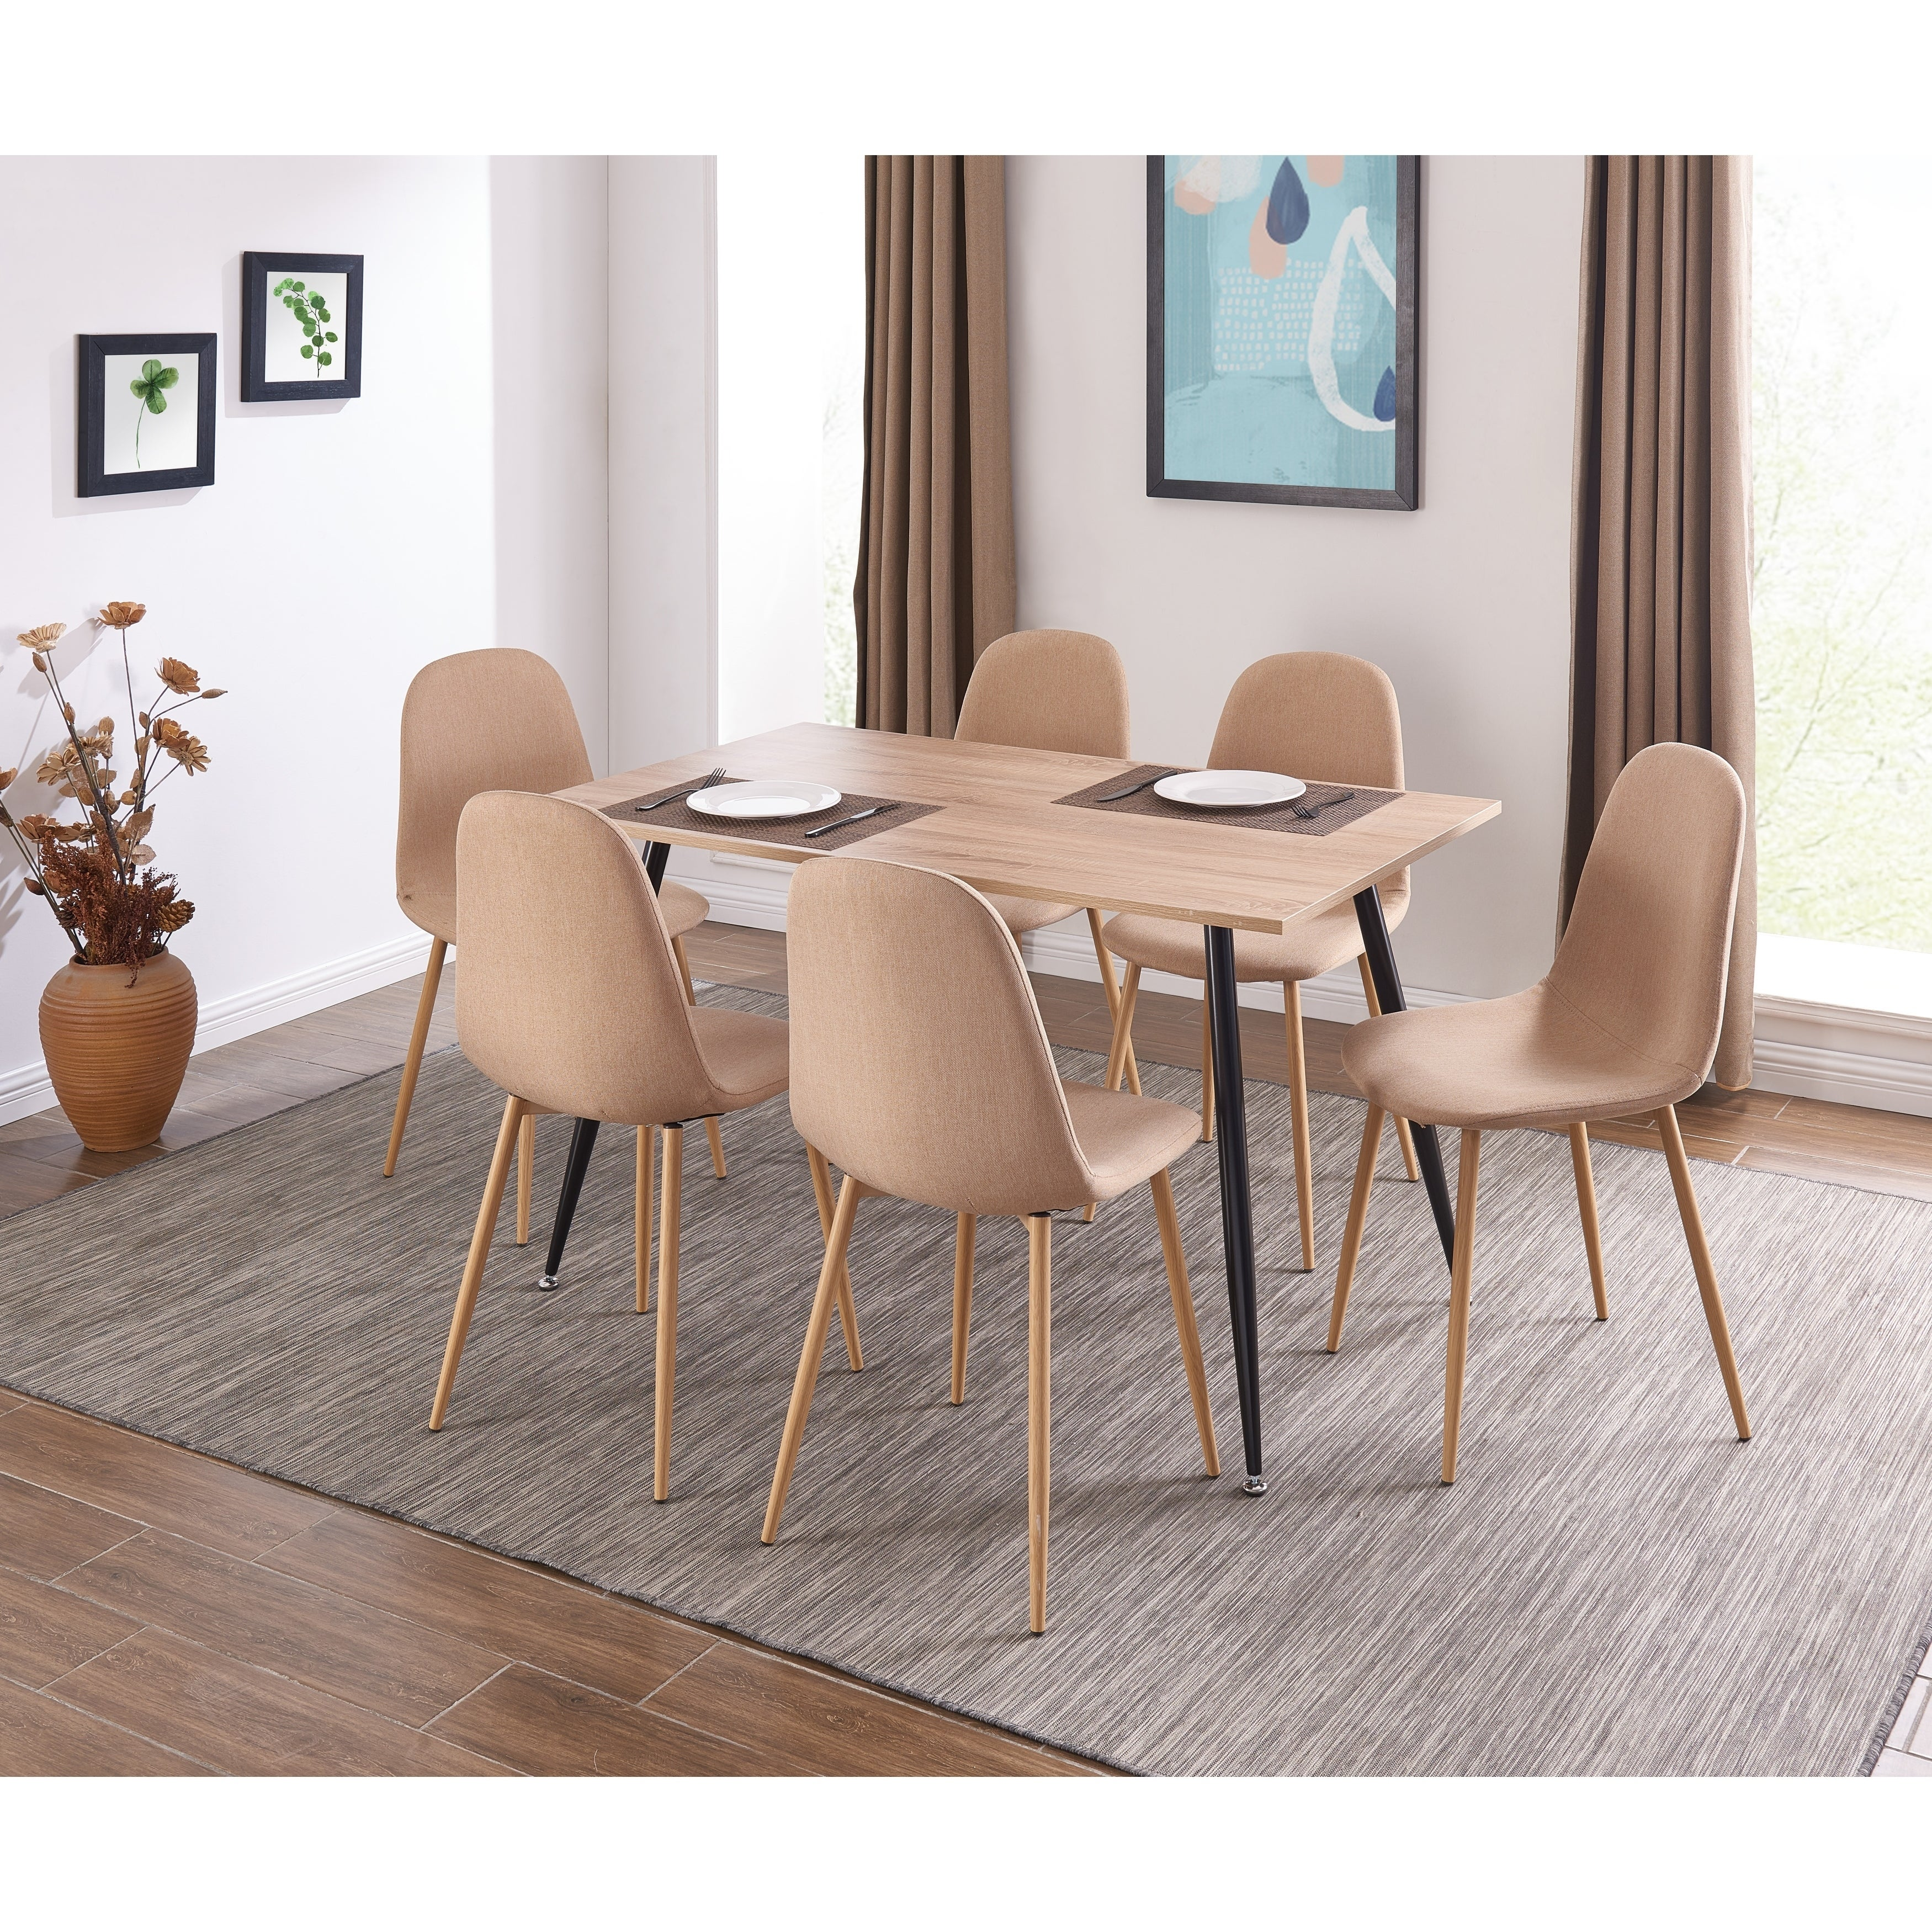 Ids Oinline Modern Style Designed Dining Table Wooden Look Mdf Top Black Coated Metal Leg Rectangular Walnut